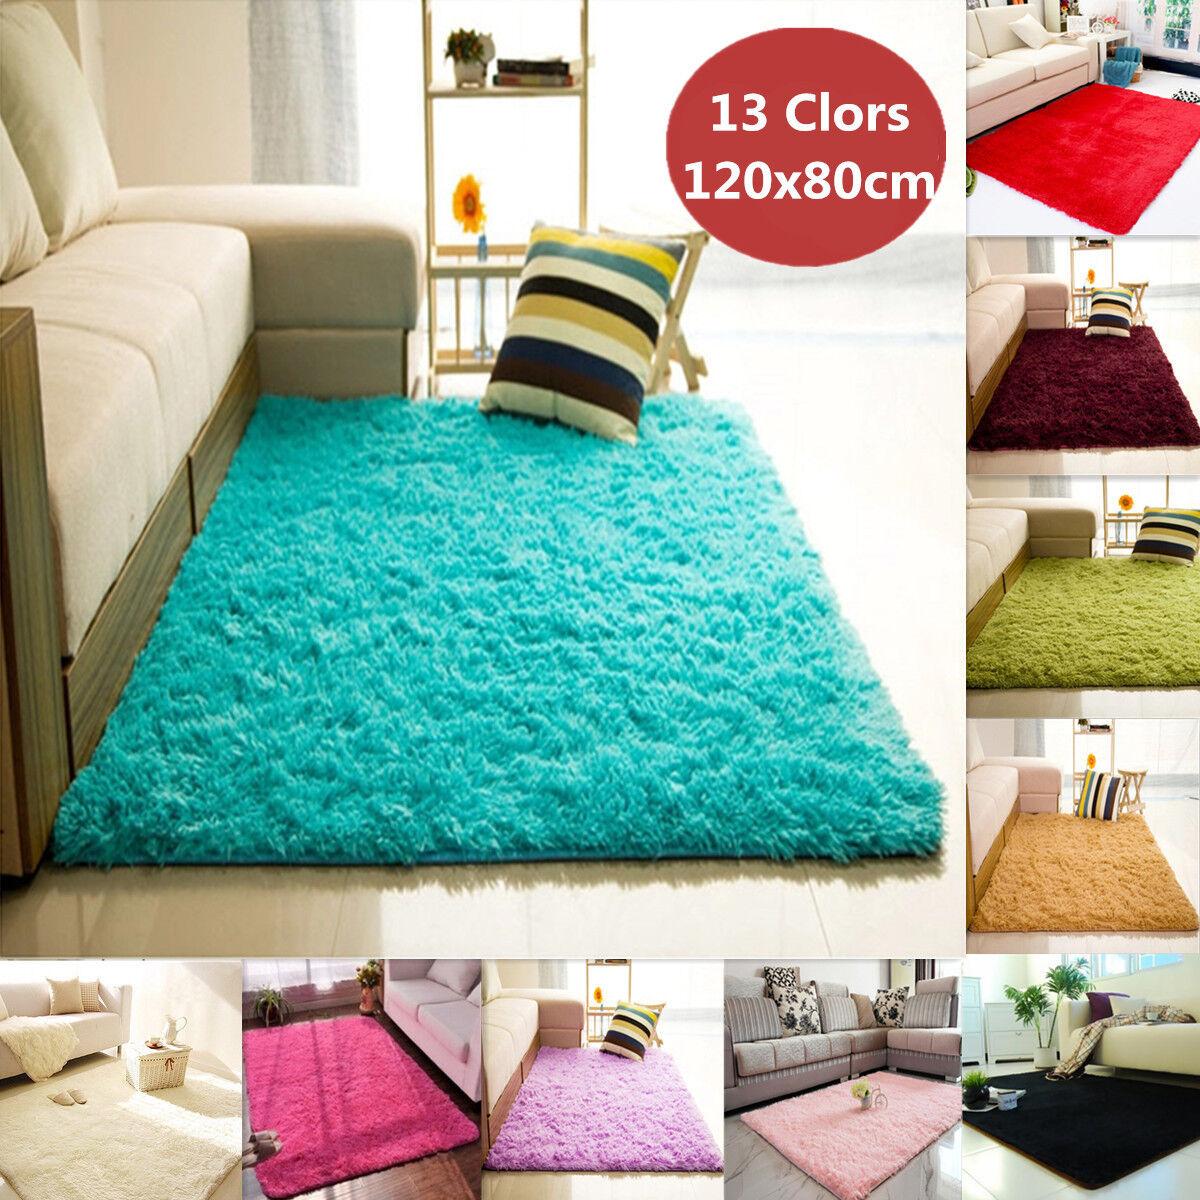 Fluffy Rugs Anti-Skid Shaggy Area Rug Home Room Carpet Floor